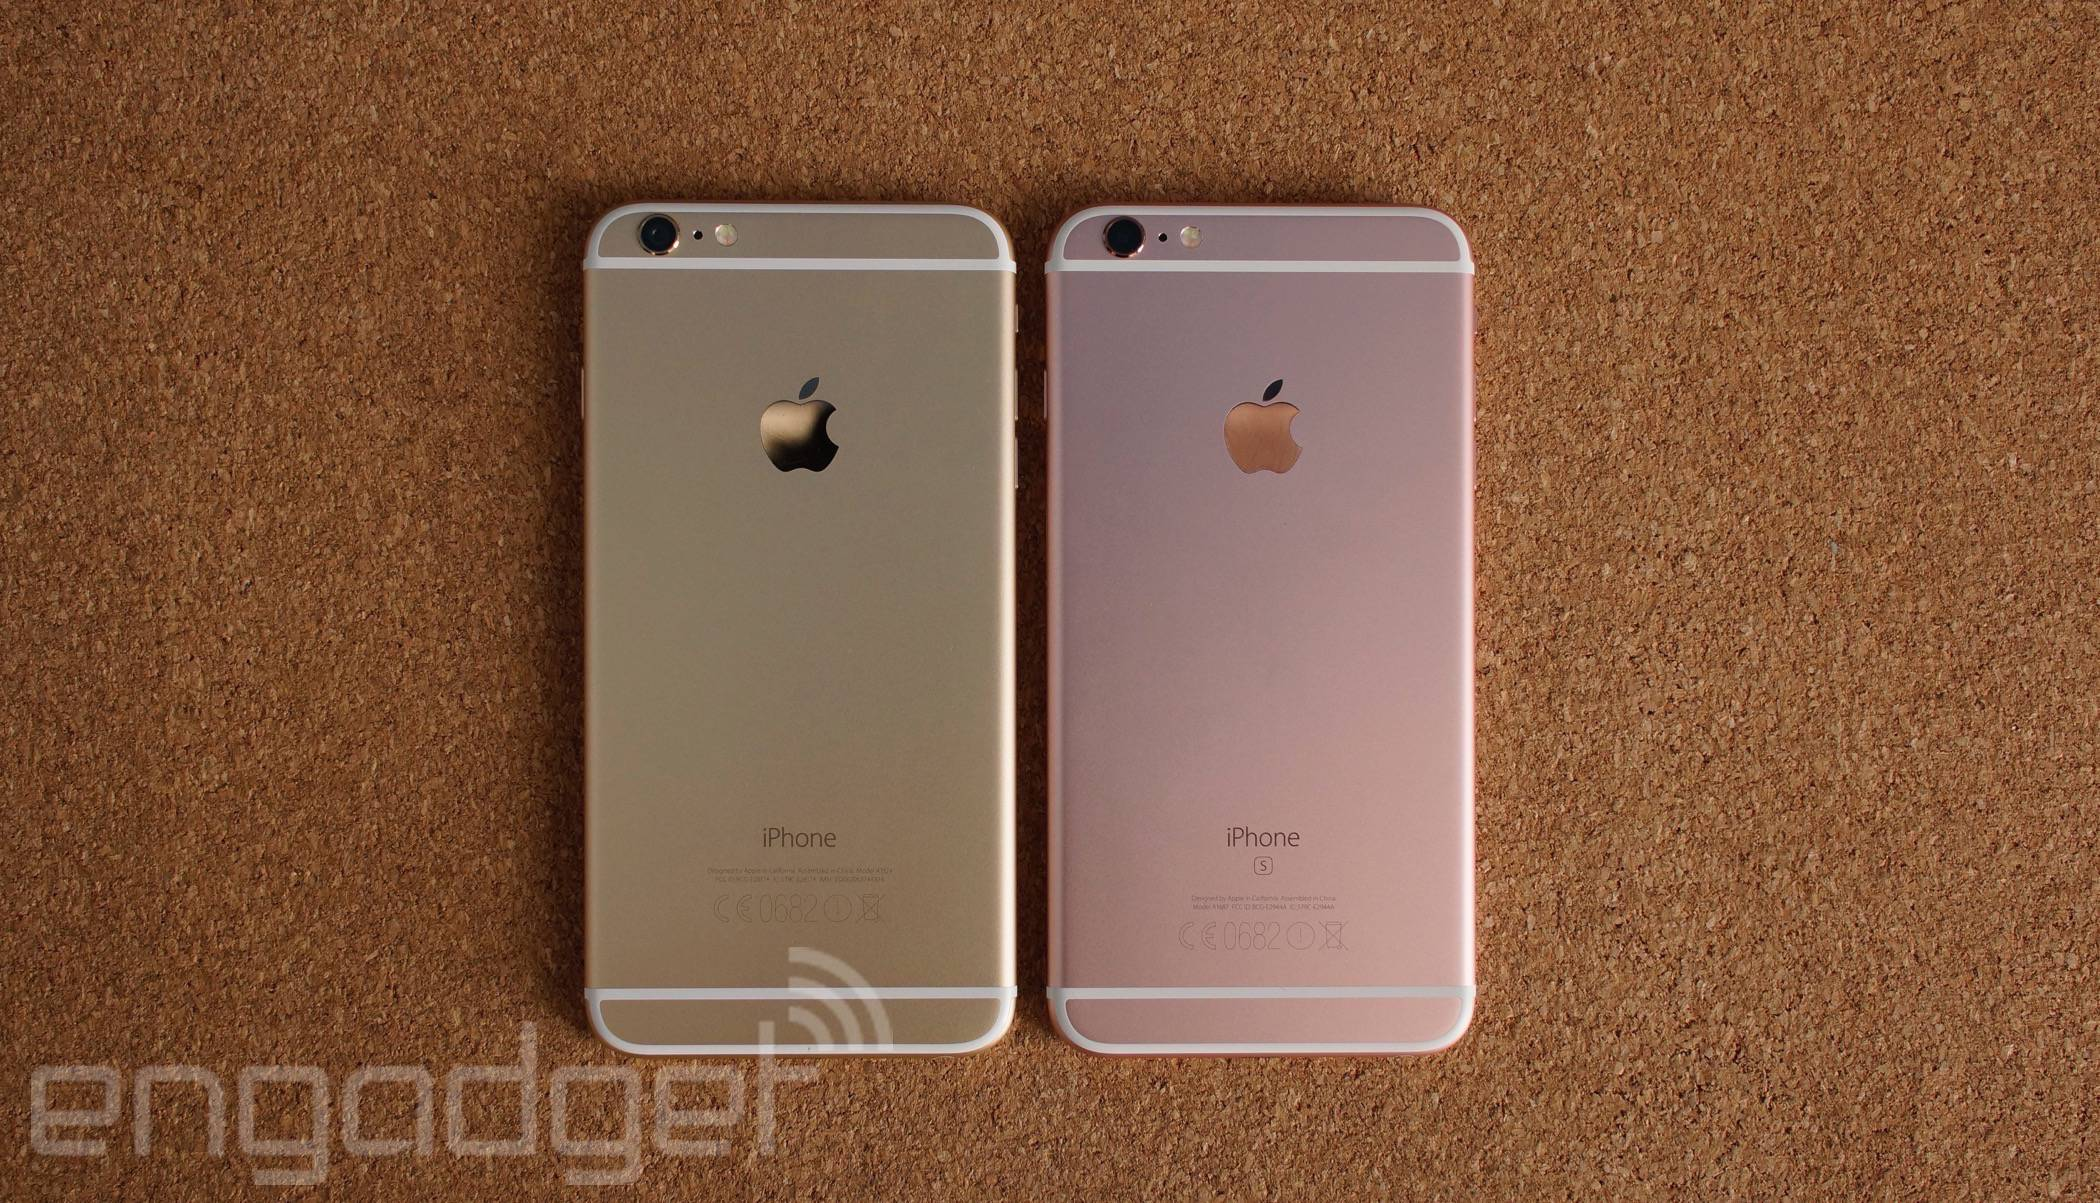 bd2a0533af2 iPhone 6s y iPhone 6s Plus, análisis – News